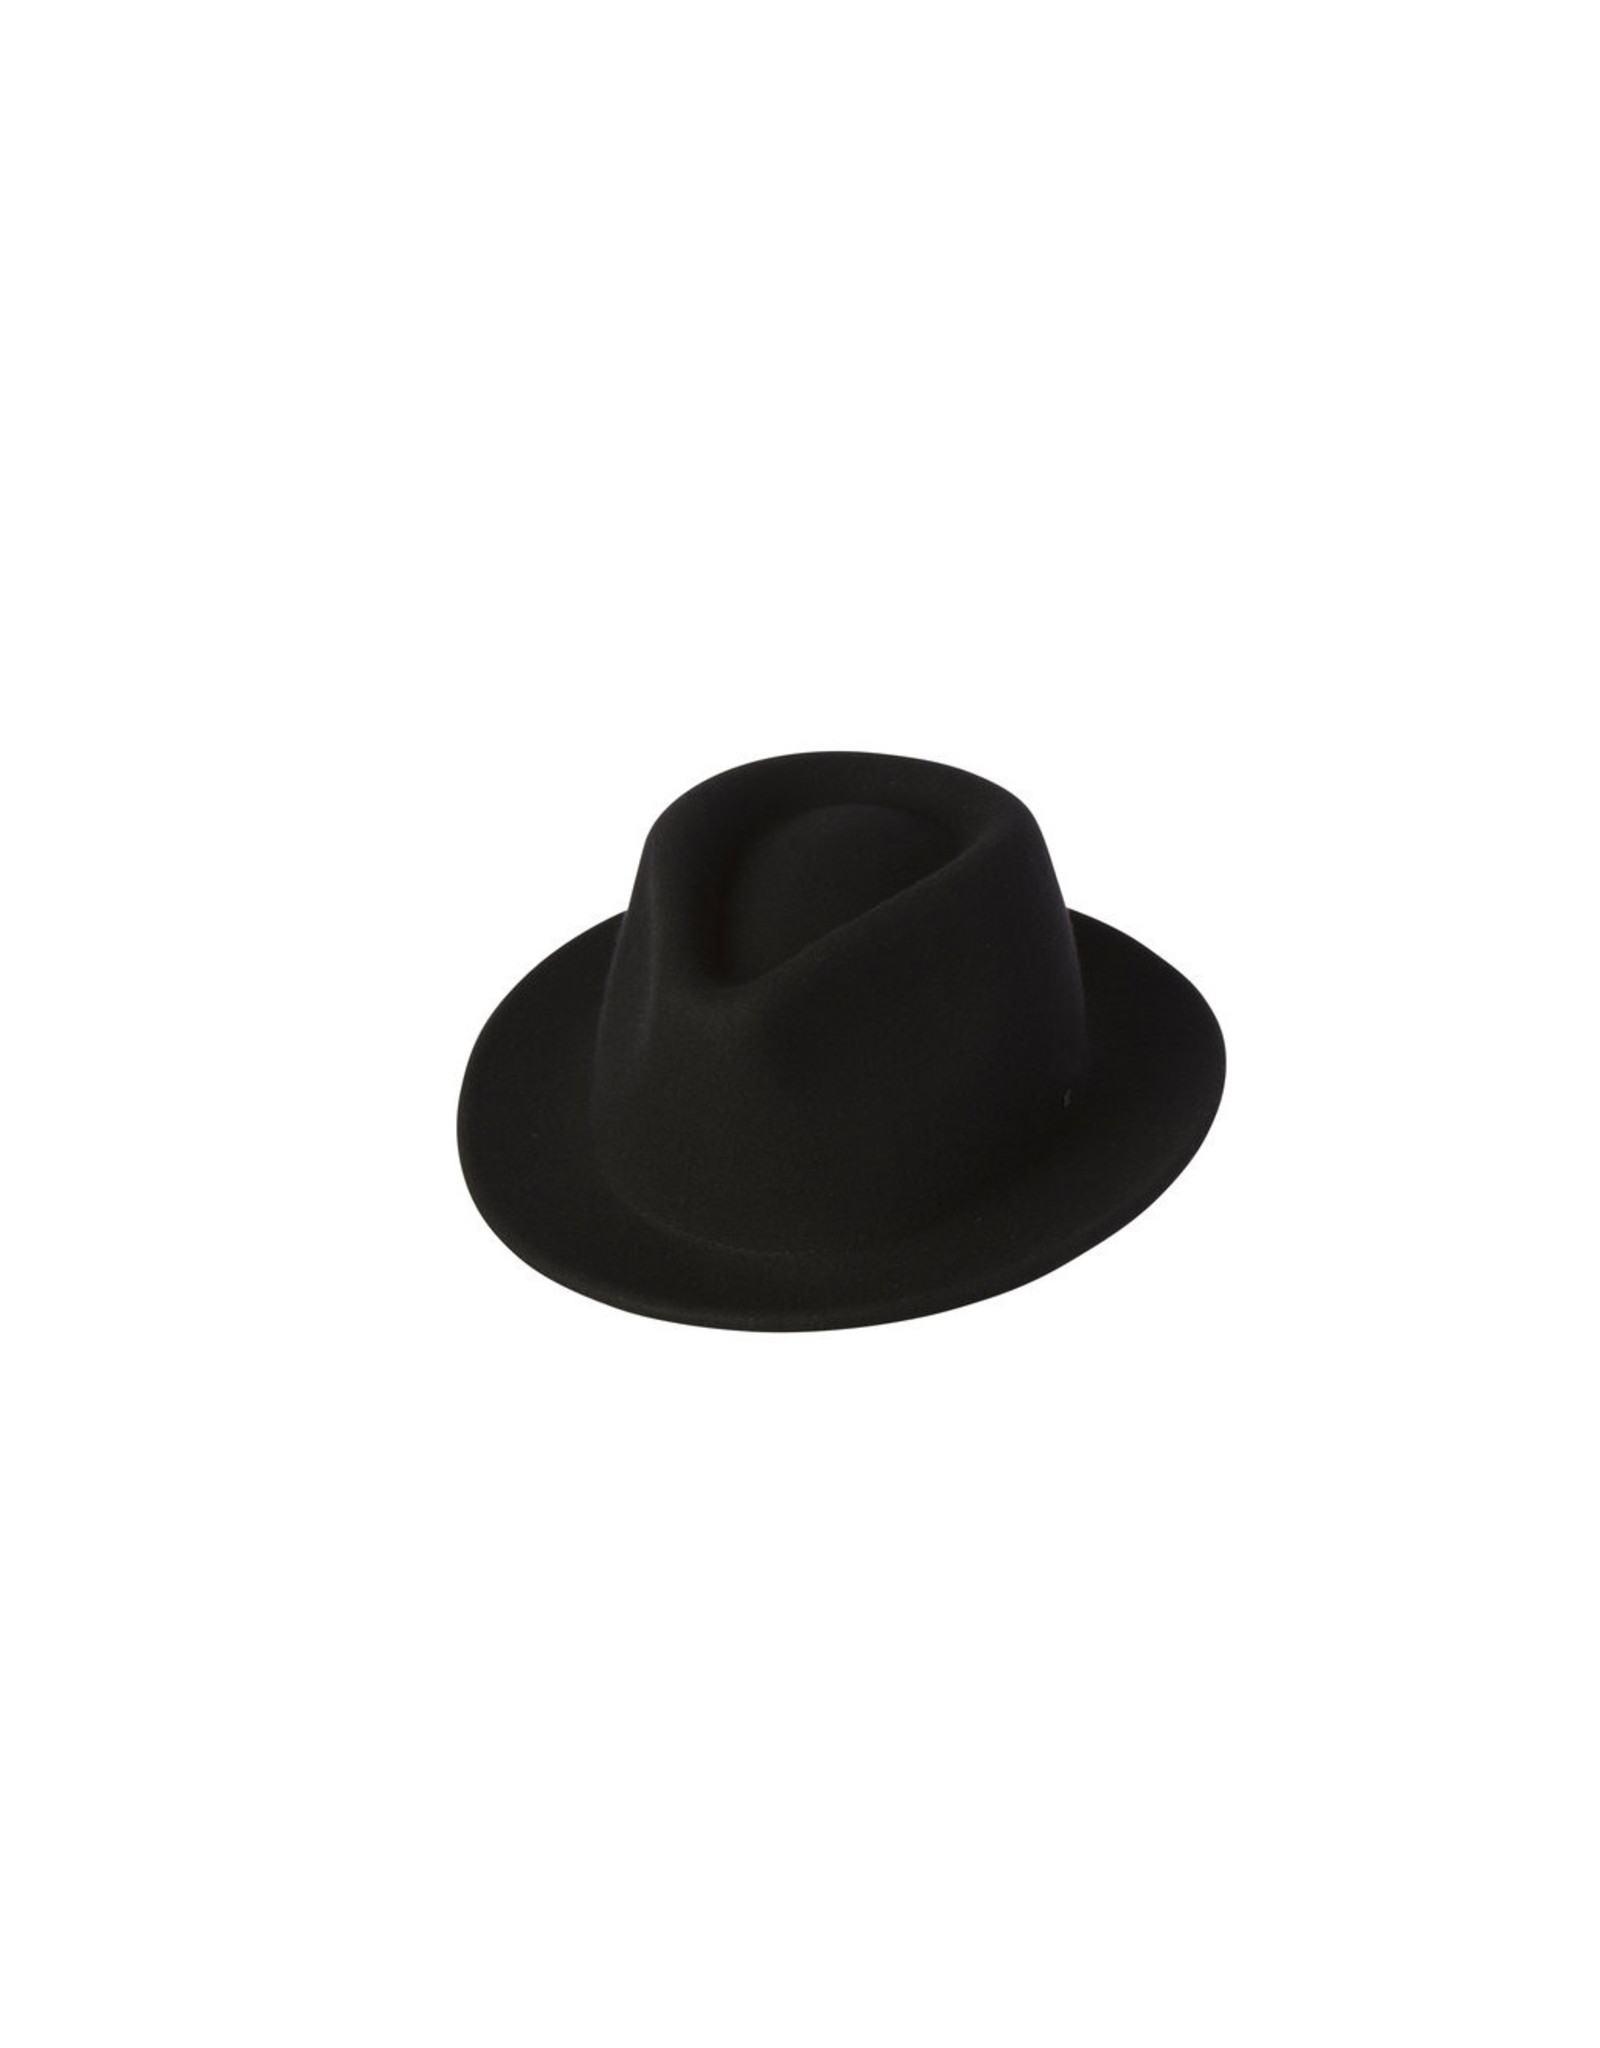 KOORINGAL MEN'S MAESTRO FELT HAT